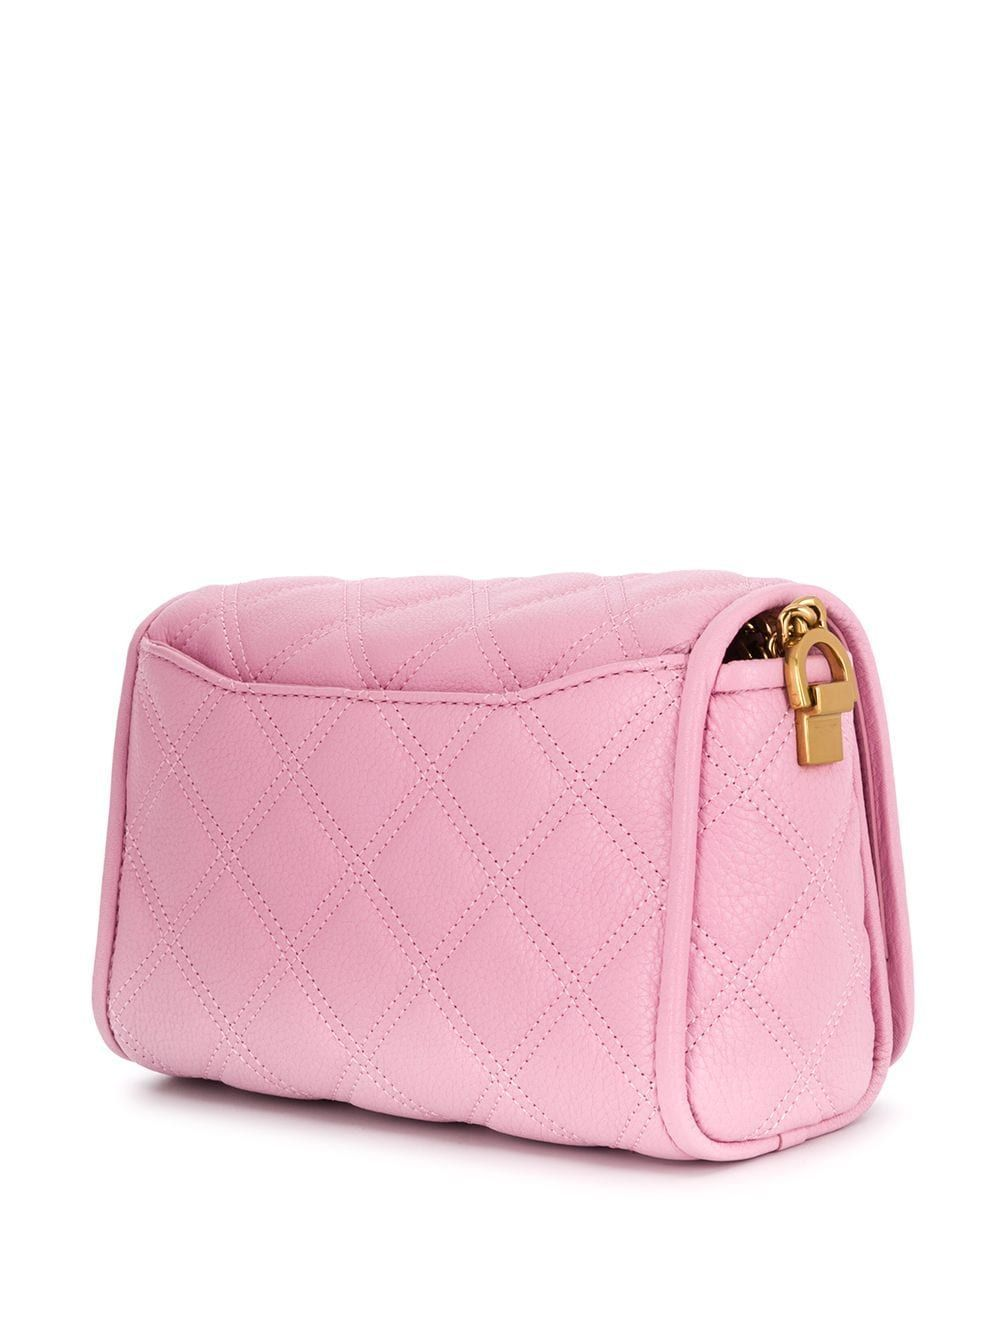 MARC JACOBS WOMEN'S M0015816668 PINK LEATHER SHOULDER BAG